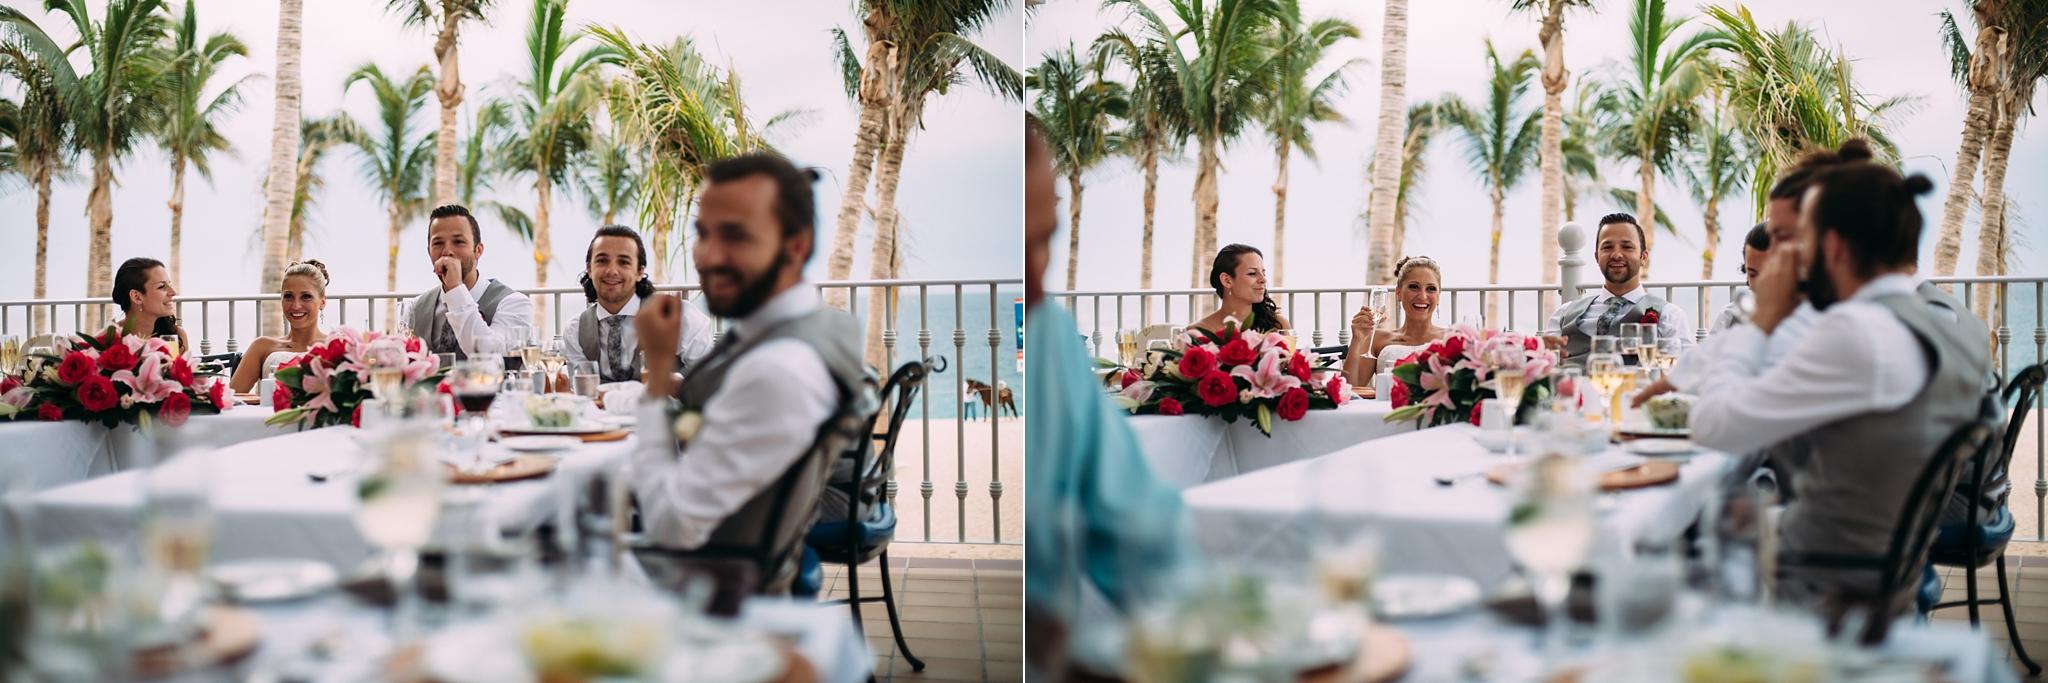 kaihla_tonai_intimate_wedding_elopement_photographer_1383